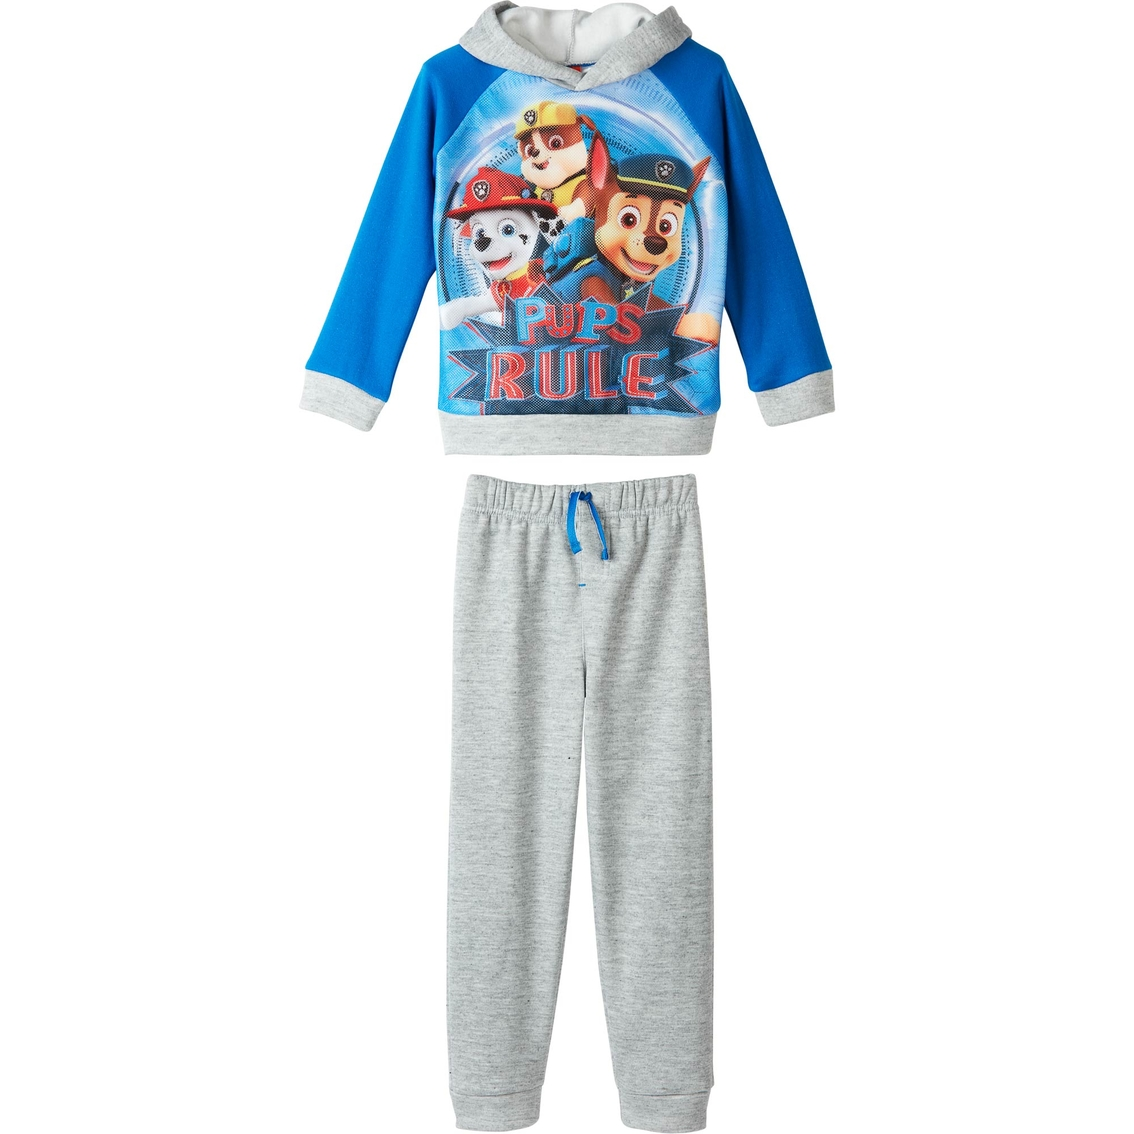 Nickelodeon Boys Paw Patrol Sportswear Set